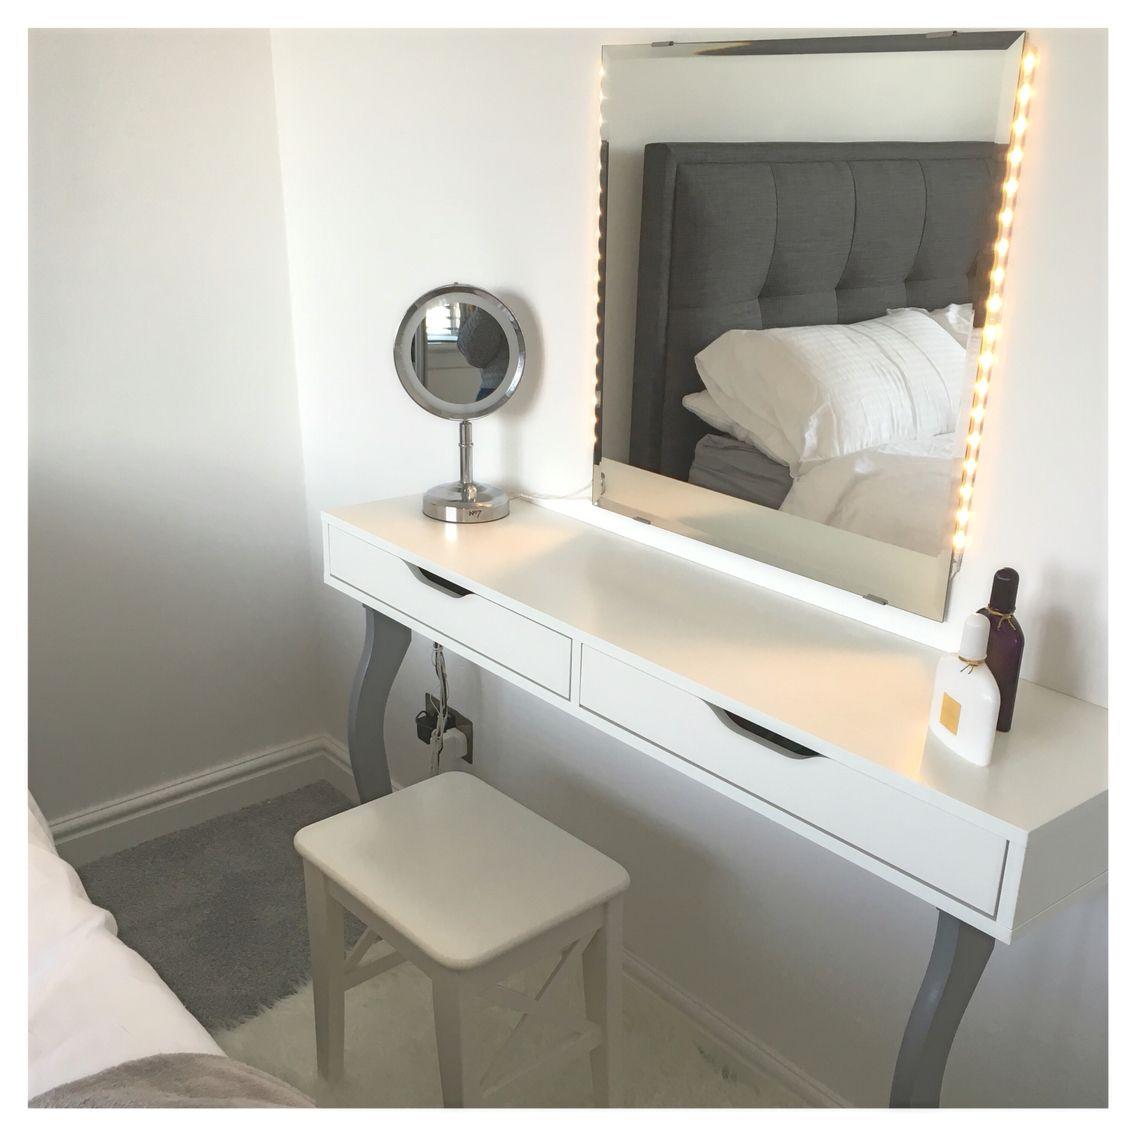 Ikea hack ekby alex shelf with kolja mirror and dioder lights